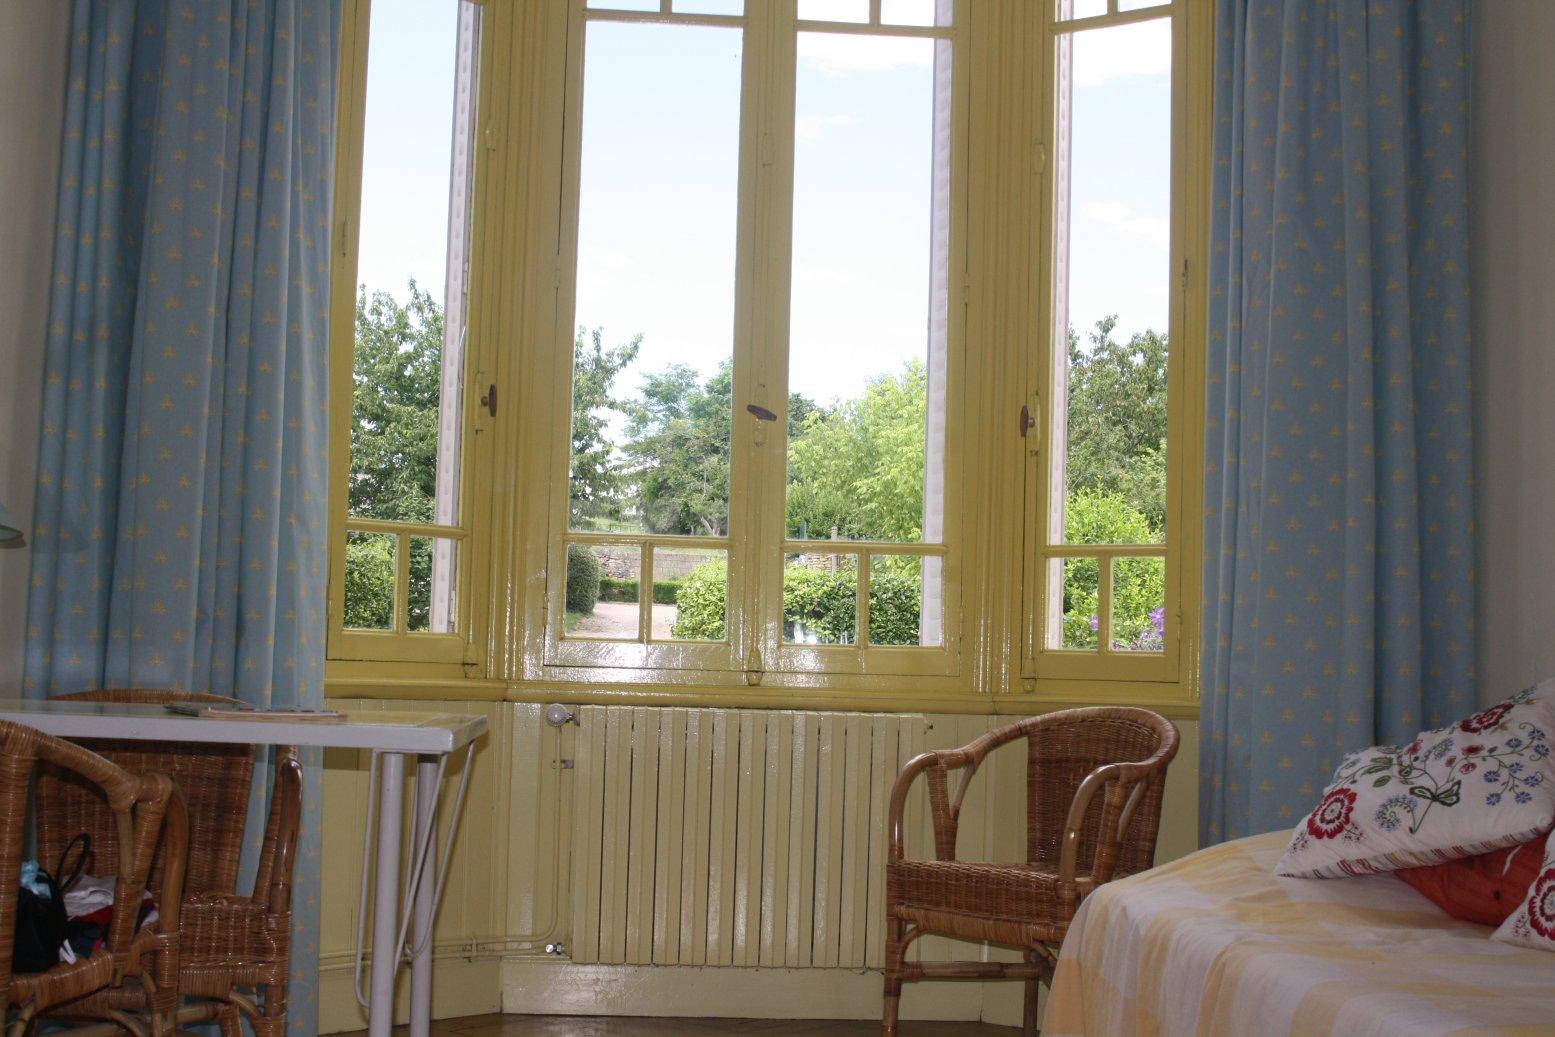 Interieur huis in bourgondië